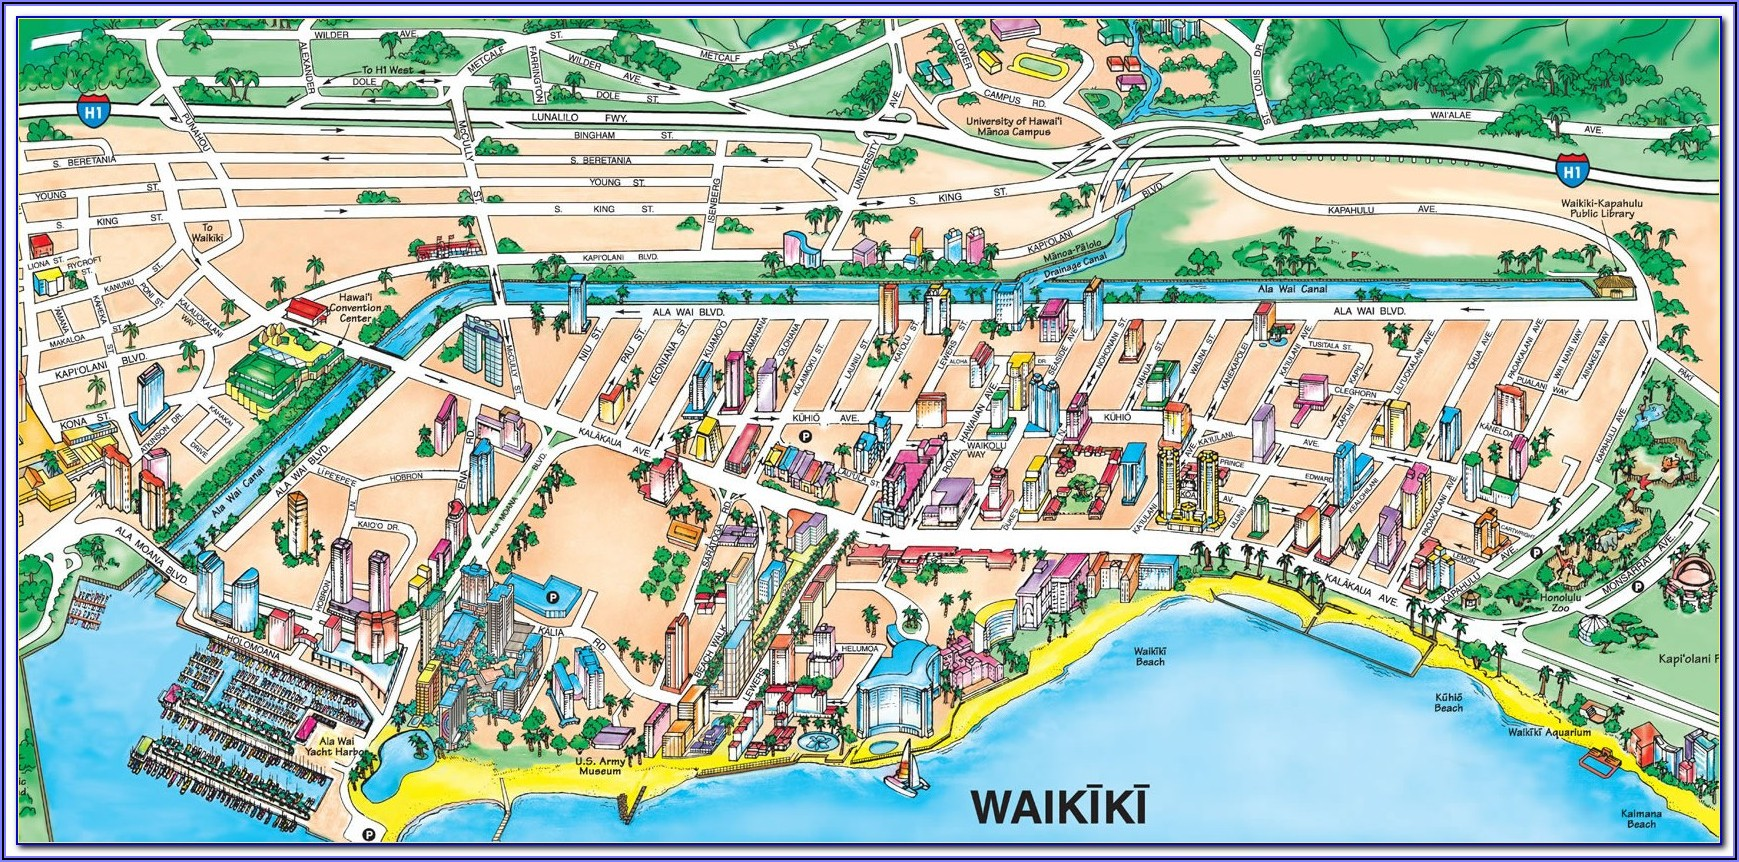 Map Of Waikiki Hotels And Restaurants